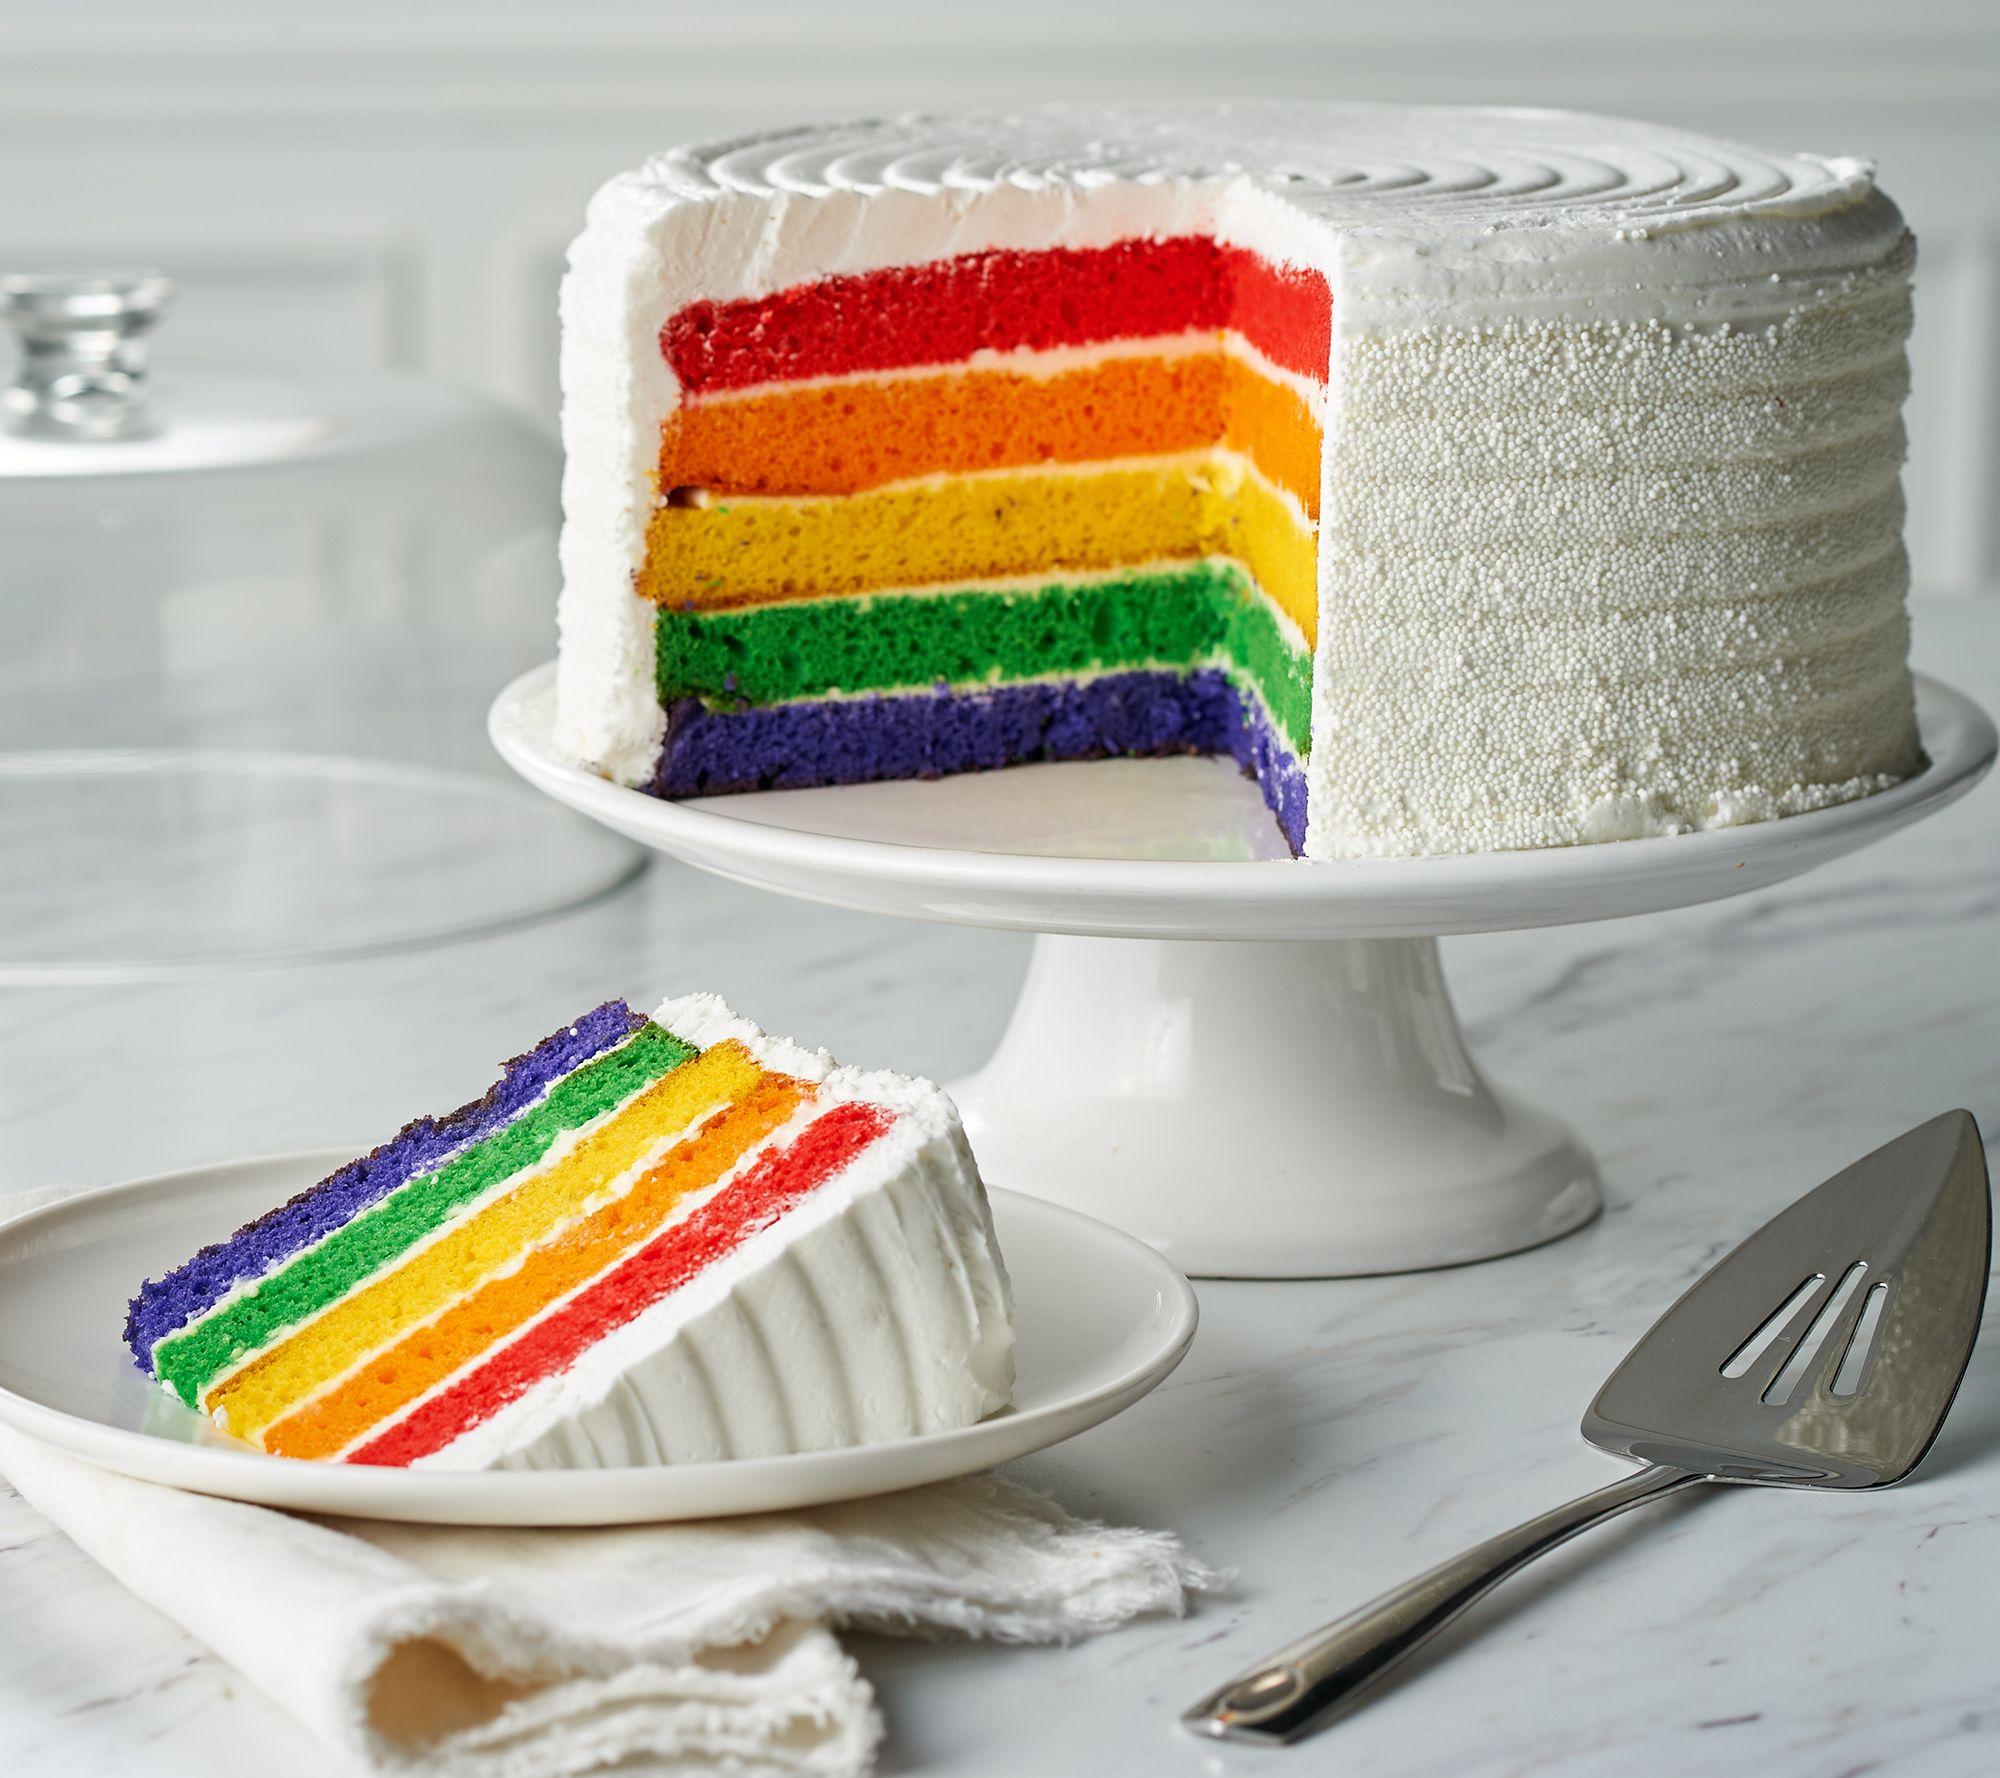 Davids Cookies 7 Lb Rainbow Layer Cake